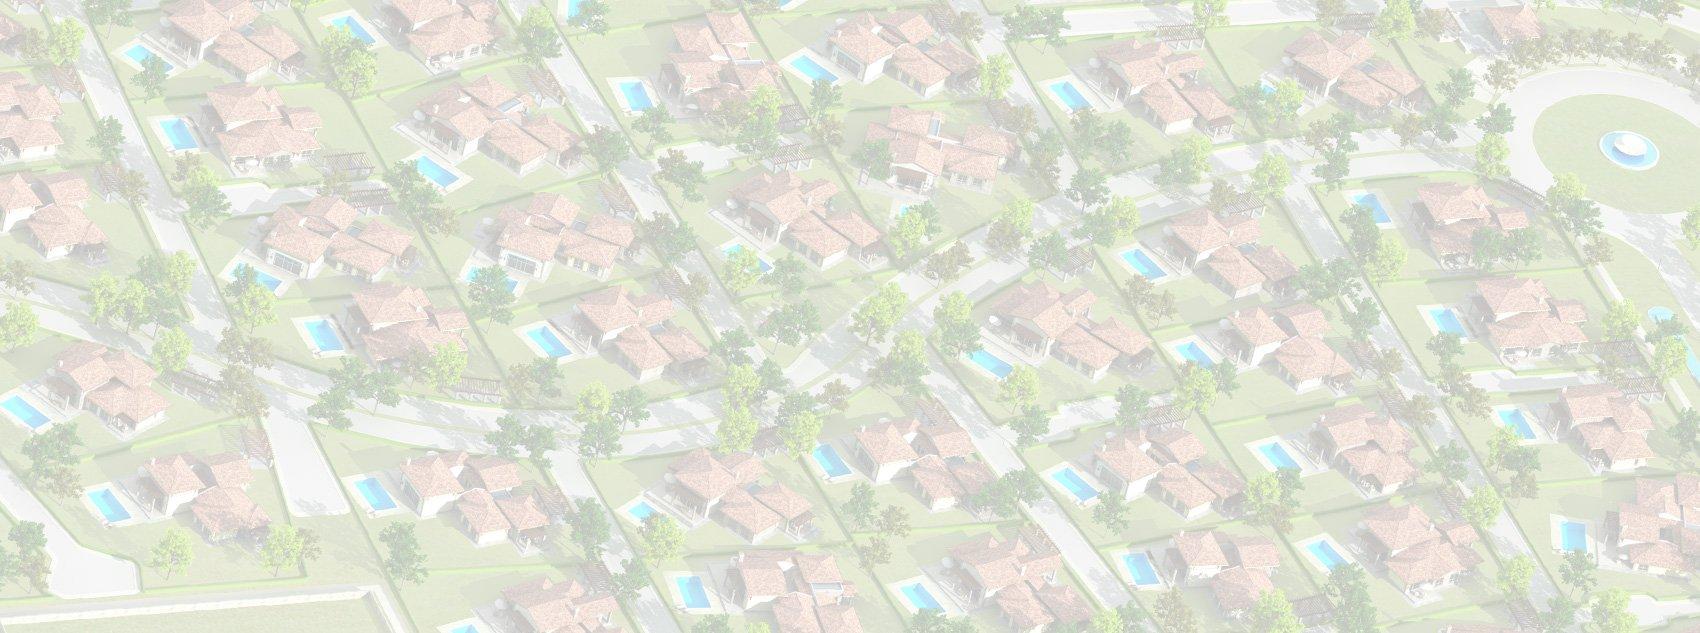 park_village